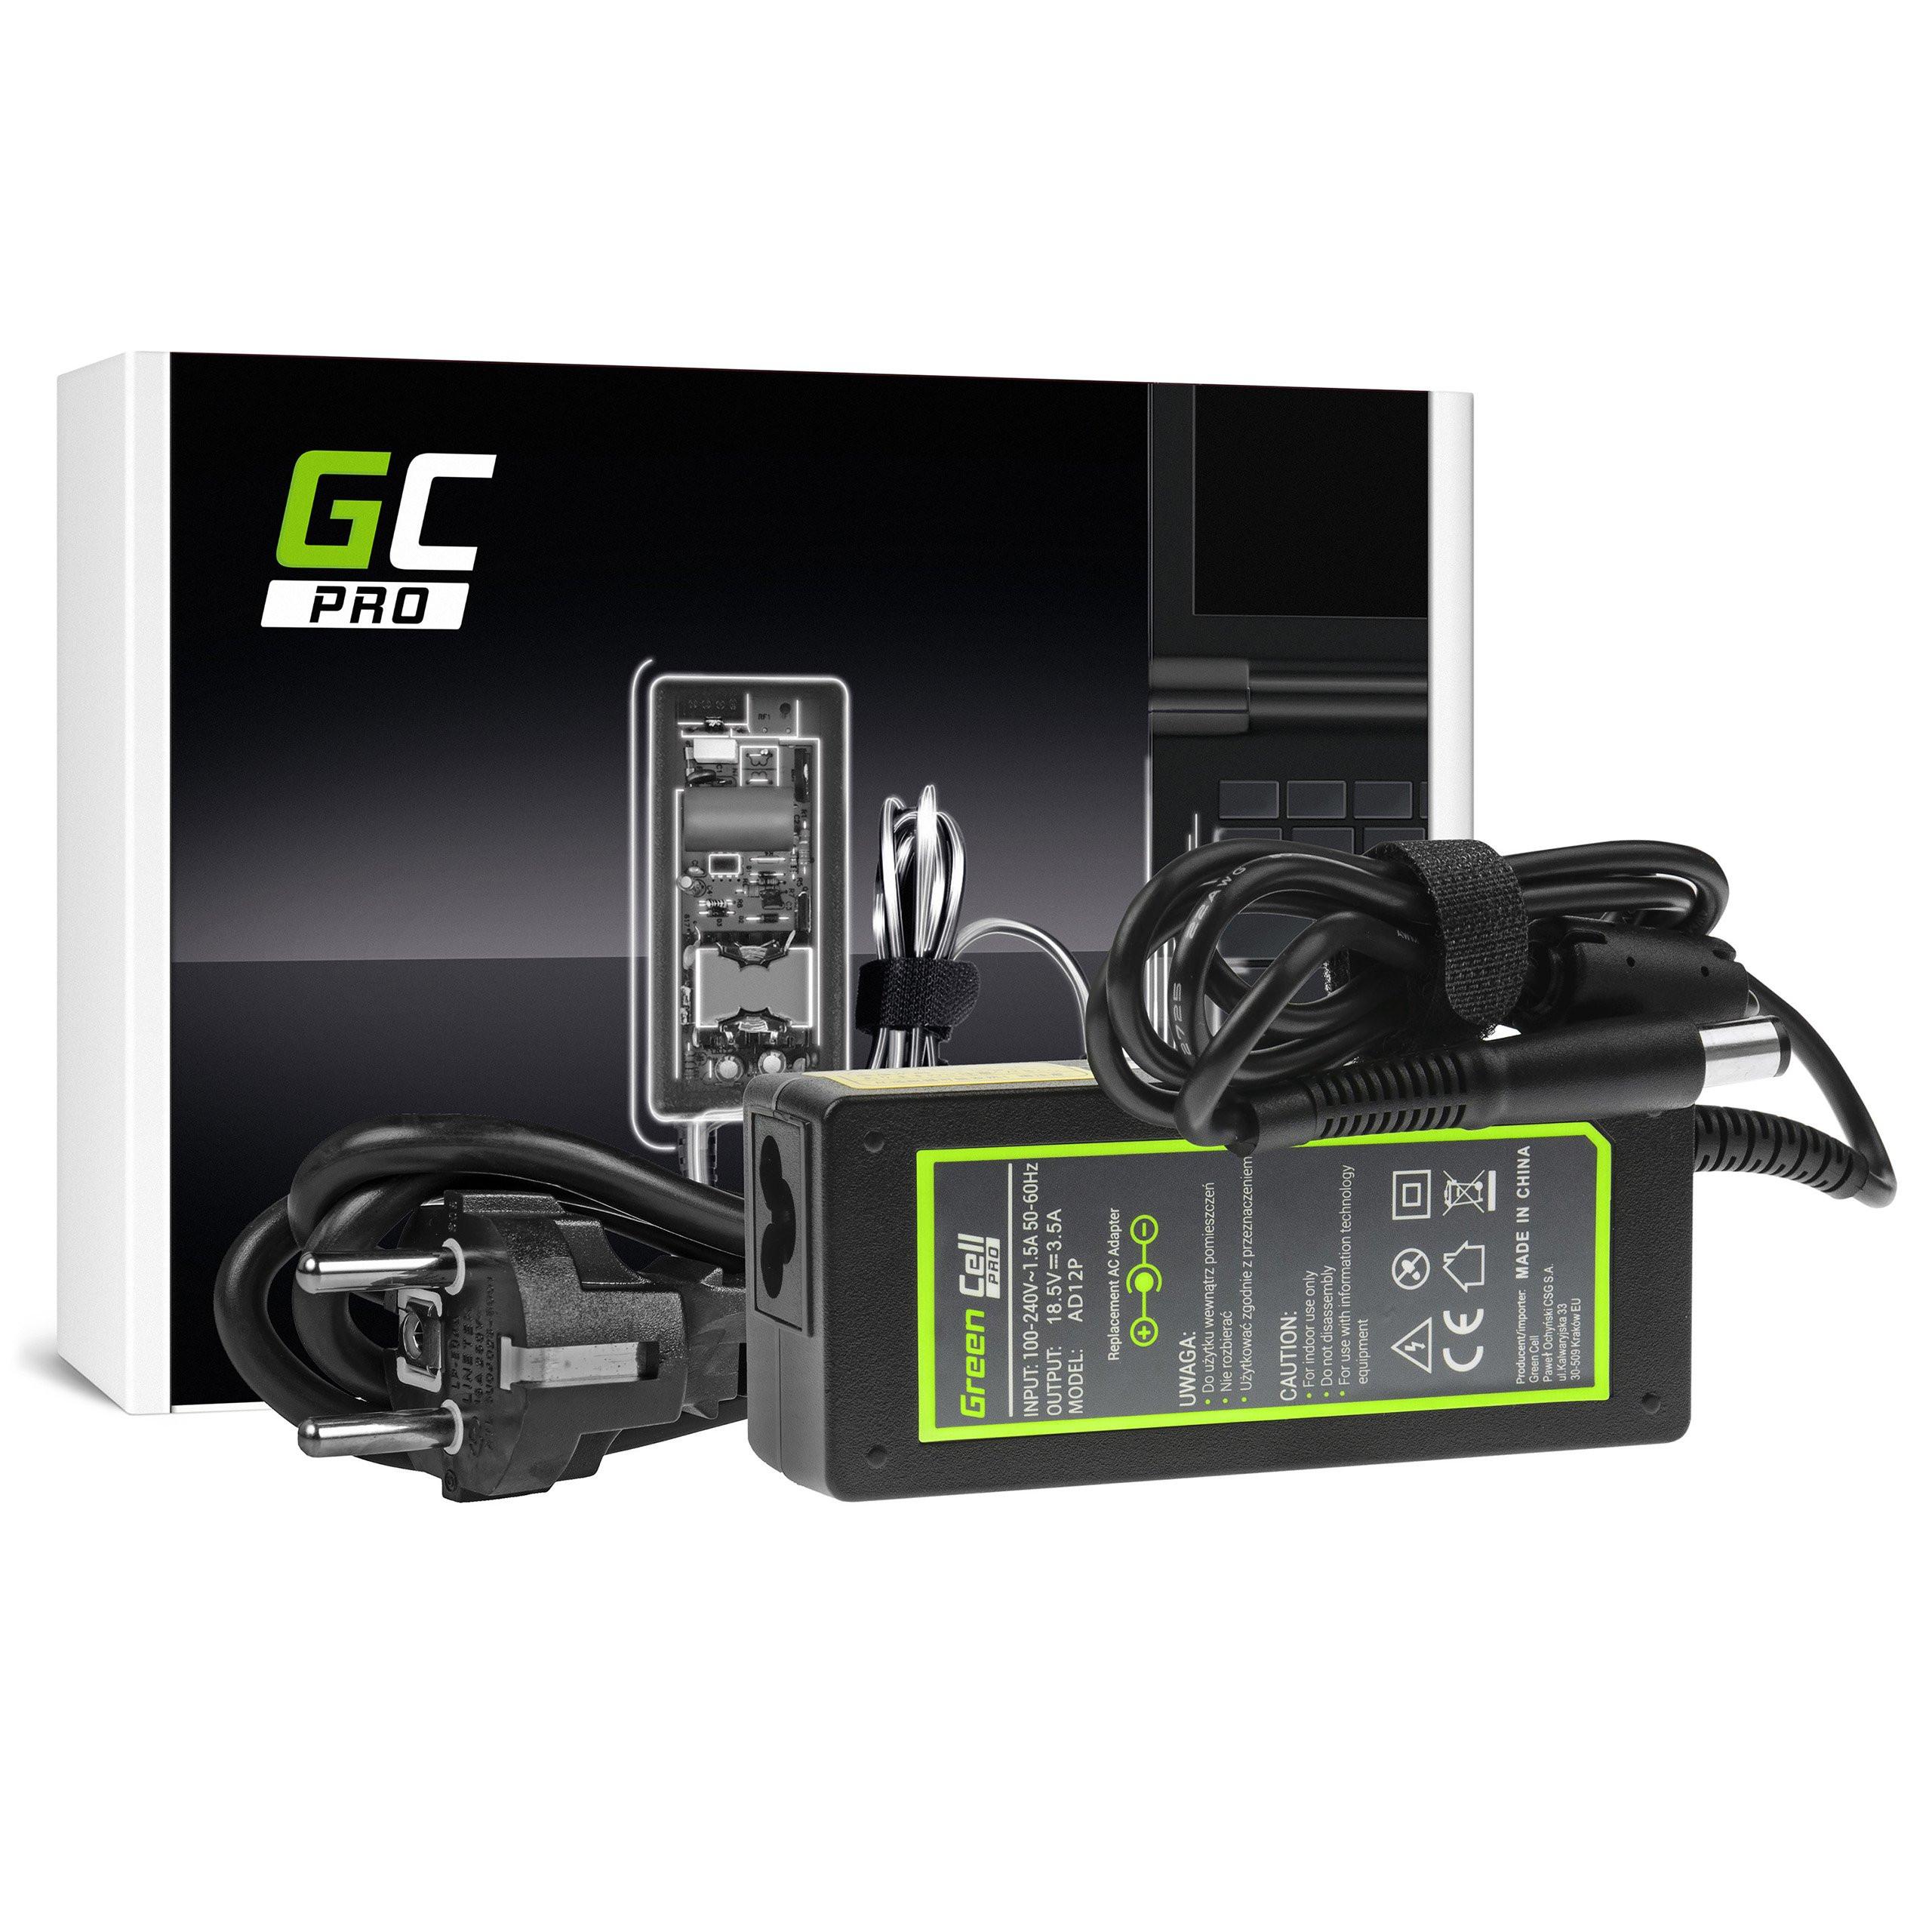 Green Cell PRO Charger AC Adapter 18.5V 3.5A 65W for HP 250 G1 255 G1 ProBook 450 G2 455 G2 Compaq Presario CQ56 CQ57 CQ58 CQ60